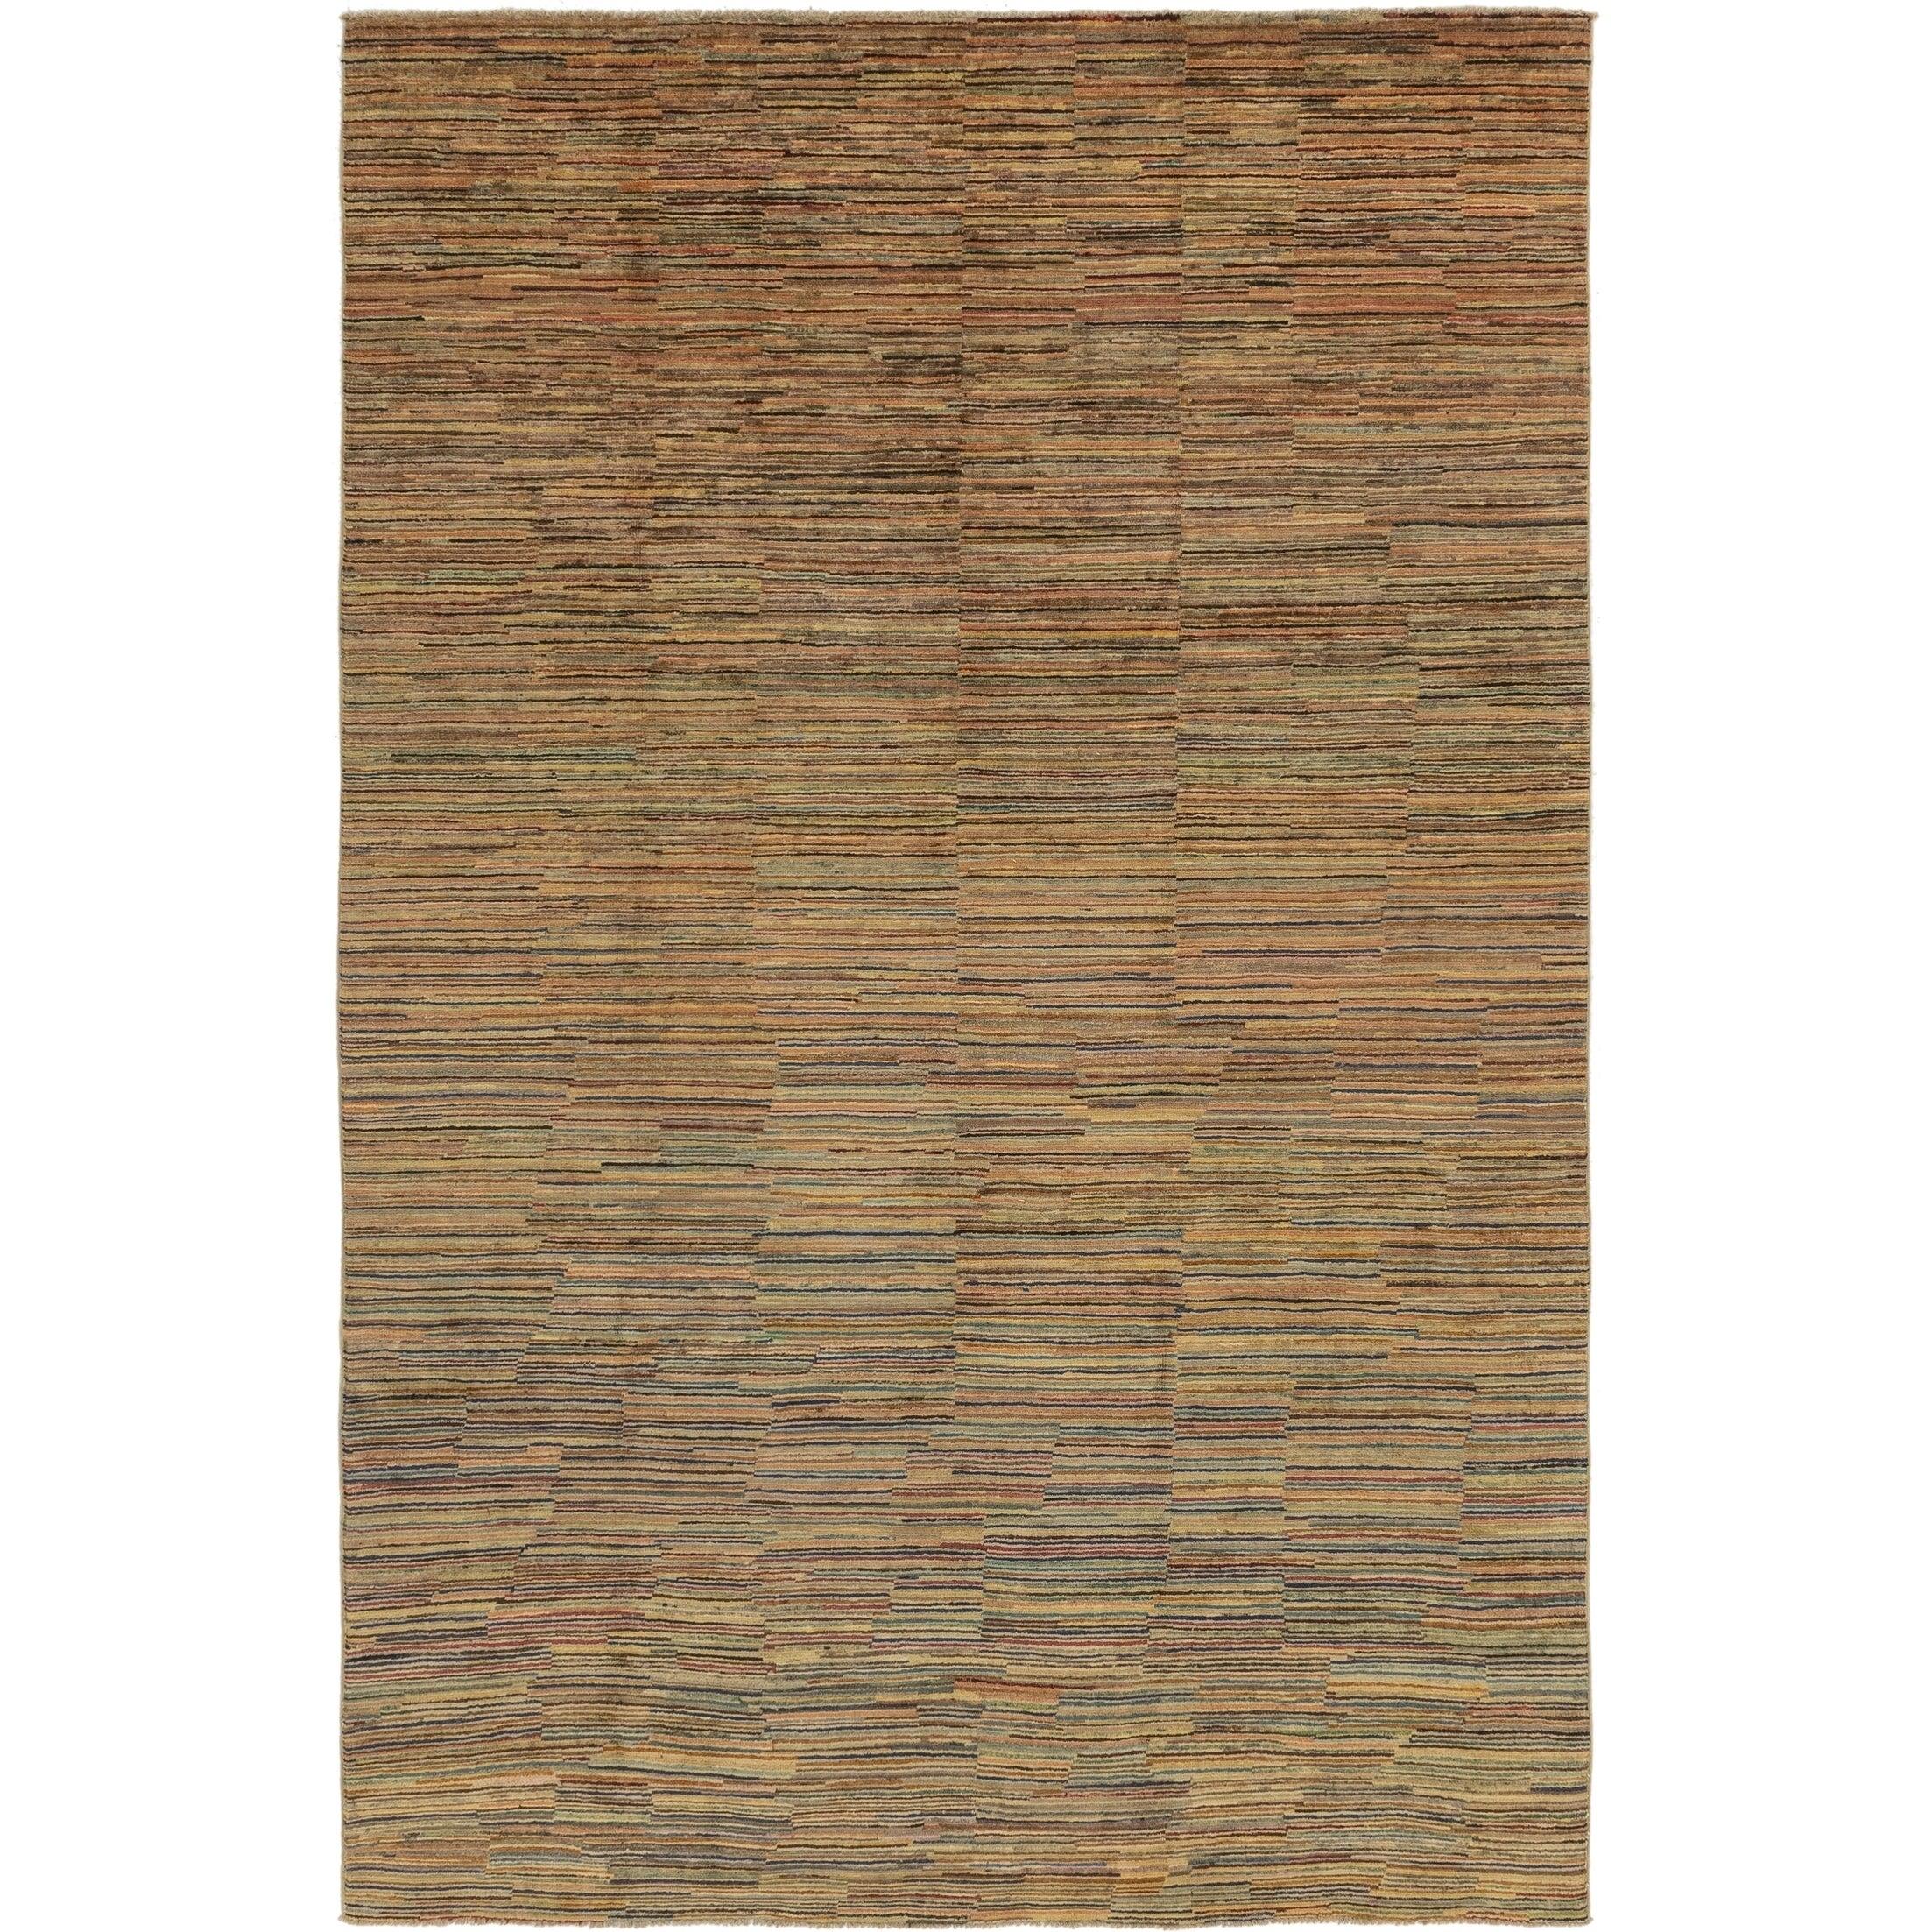 Hand Knotted Kashkuli Gabbeh Wool Area Rug - 6 5 x 9 10 (Multi - 6 5 x 9 10)